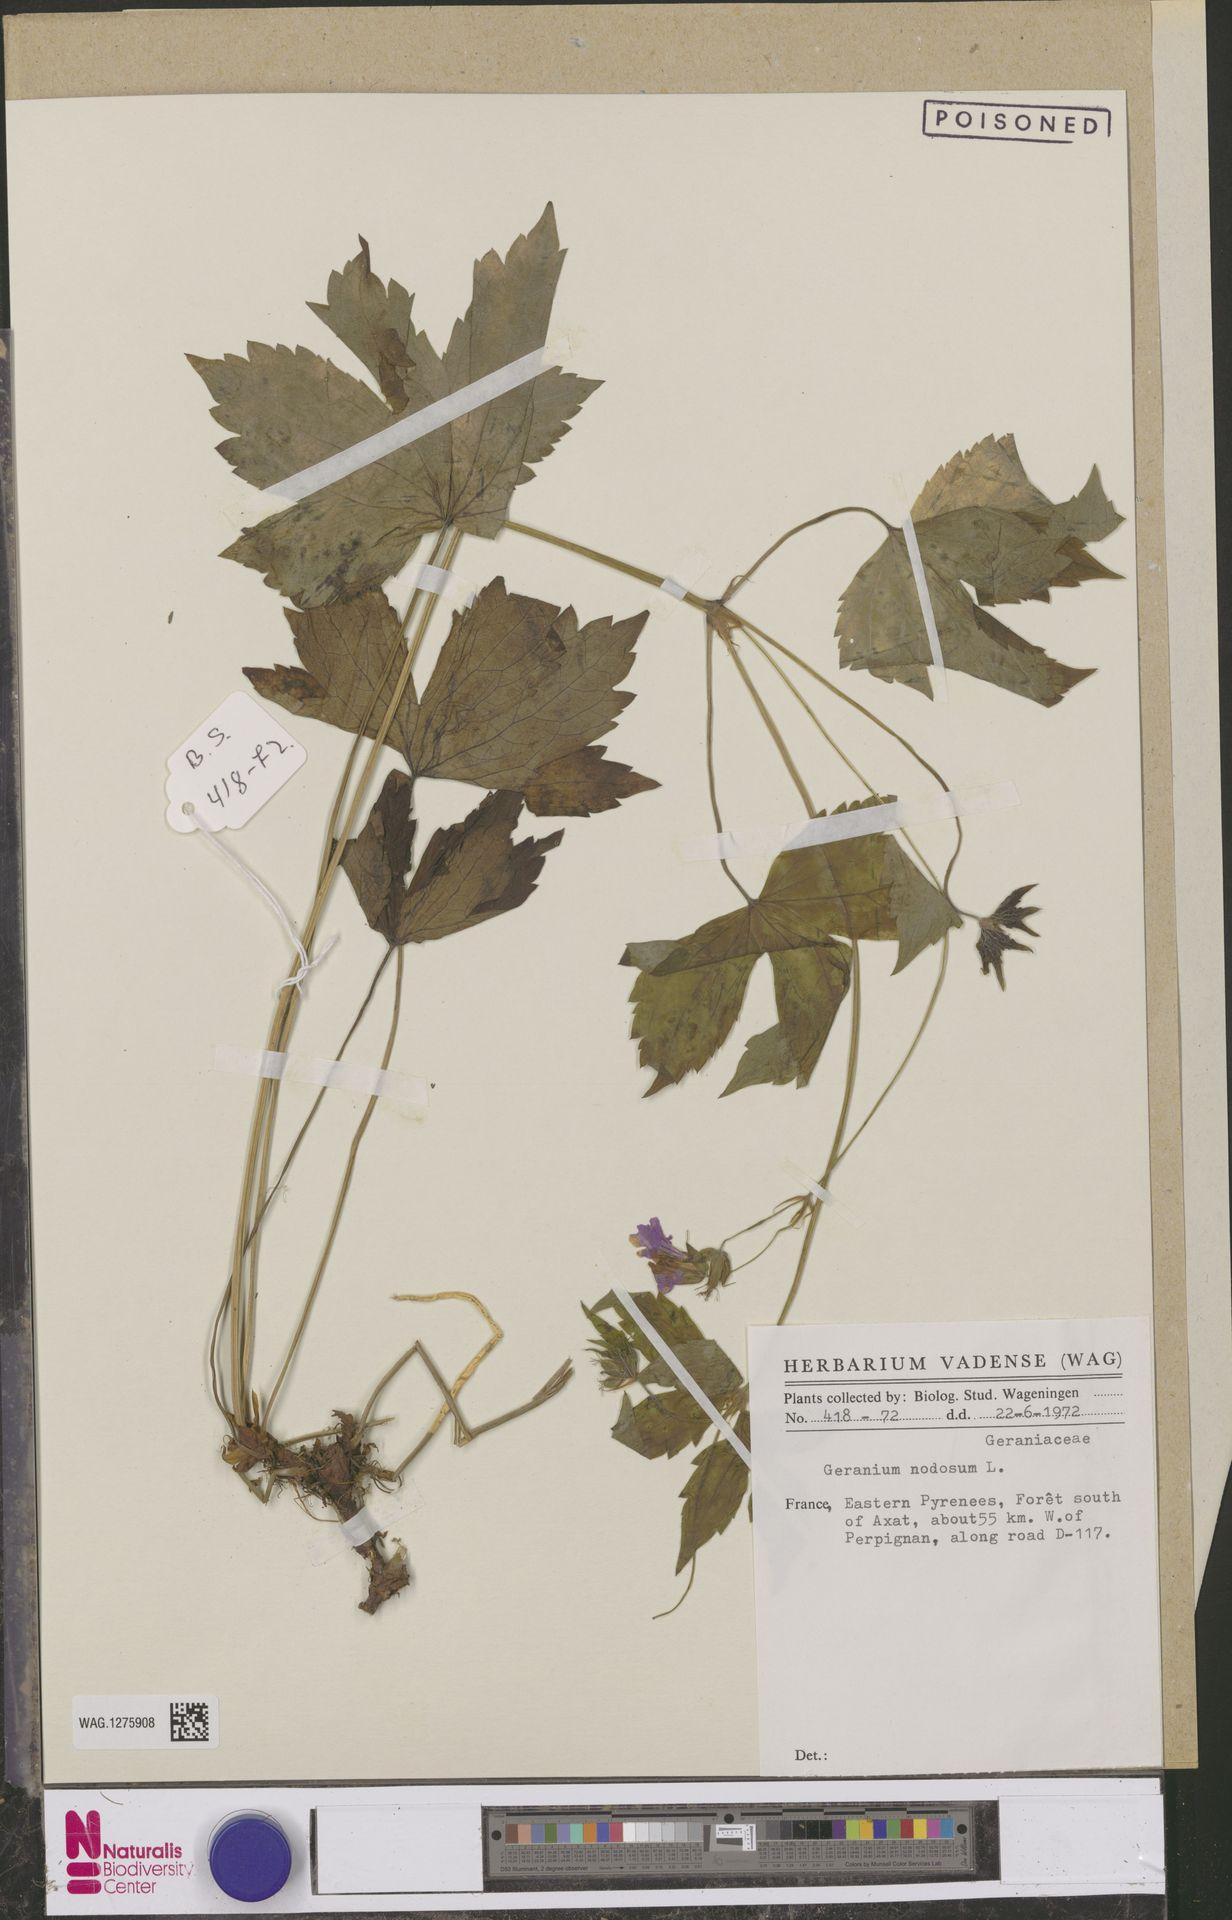 WAG.1275908   Geranium nodosum L.